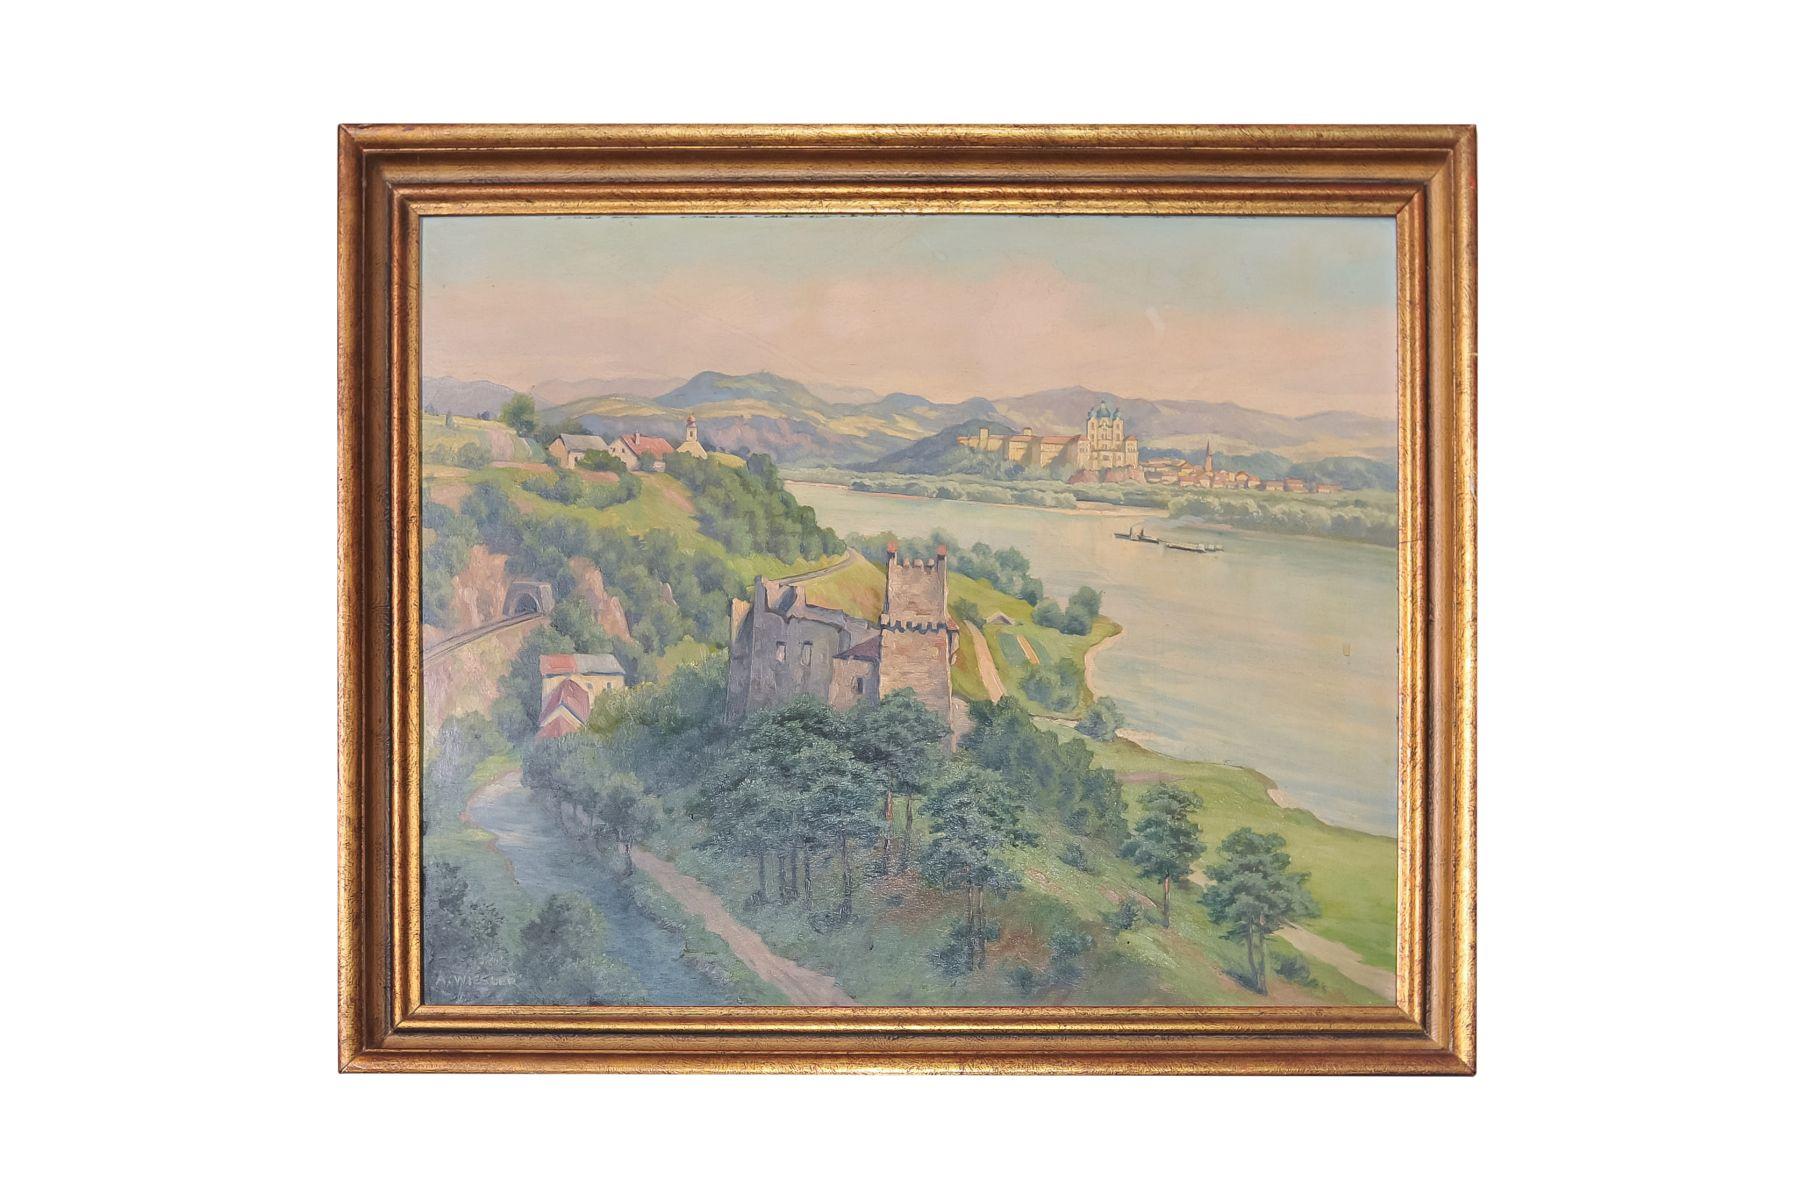 "#23 Adolf Wiesler (1878-1958) ""View Ruin Welteneg to Melk Donau"" | Adolf Wiesler (1878-1958) ""Blick Ruine Welteneg nach Melk Donau"" Image"